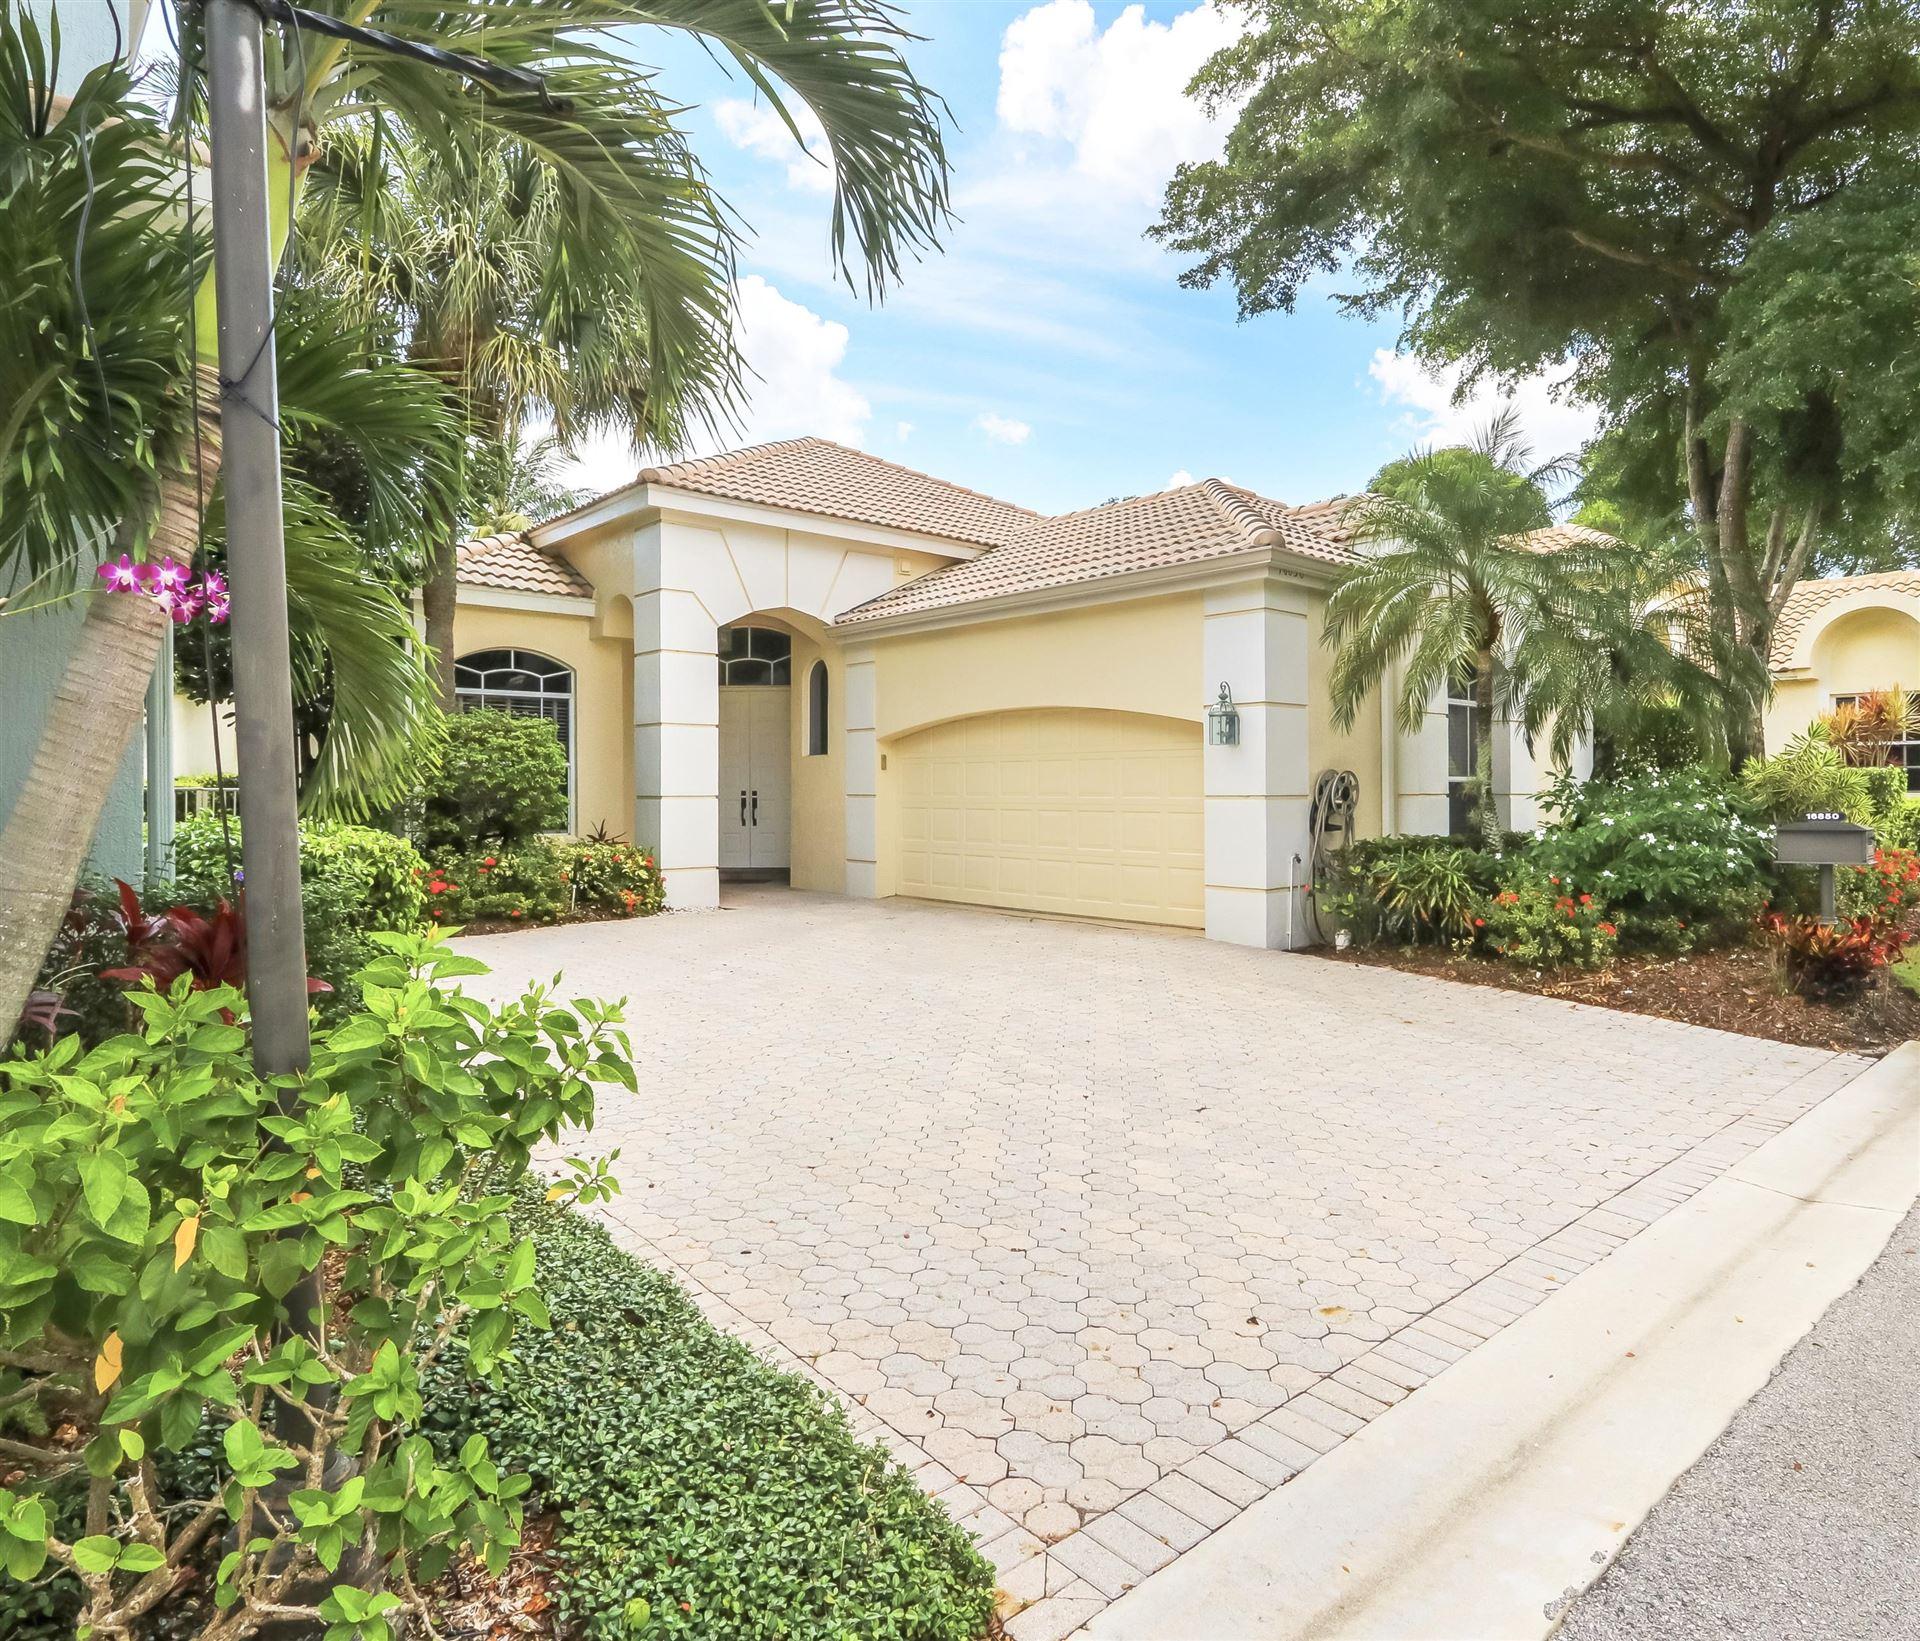 16850 Knightsbridge Lane, Delray Beach, FL 33484 - MLS#: RX-10746603